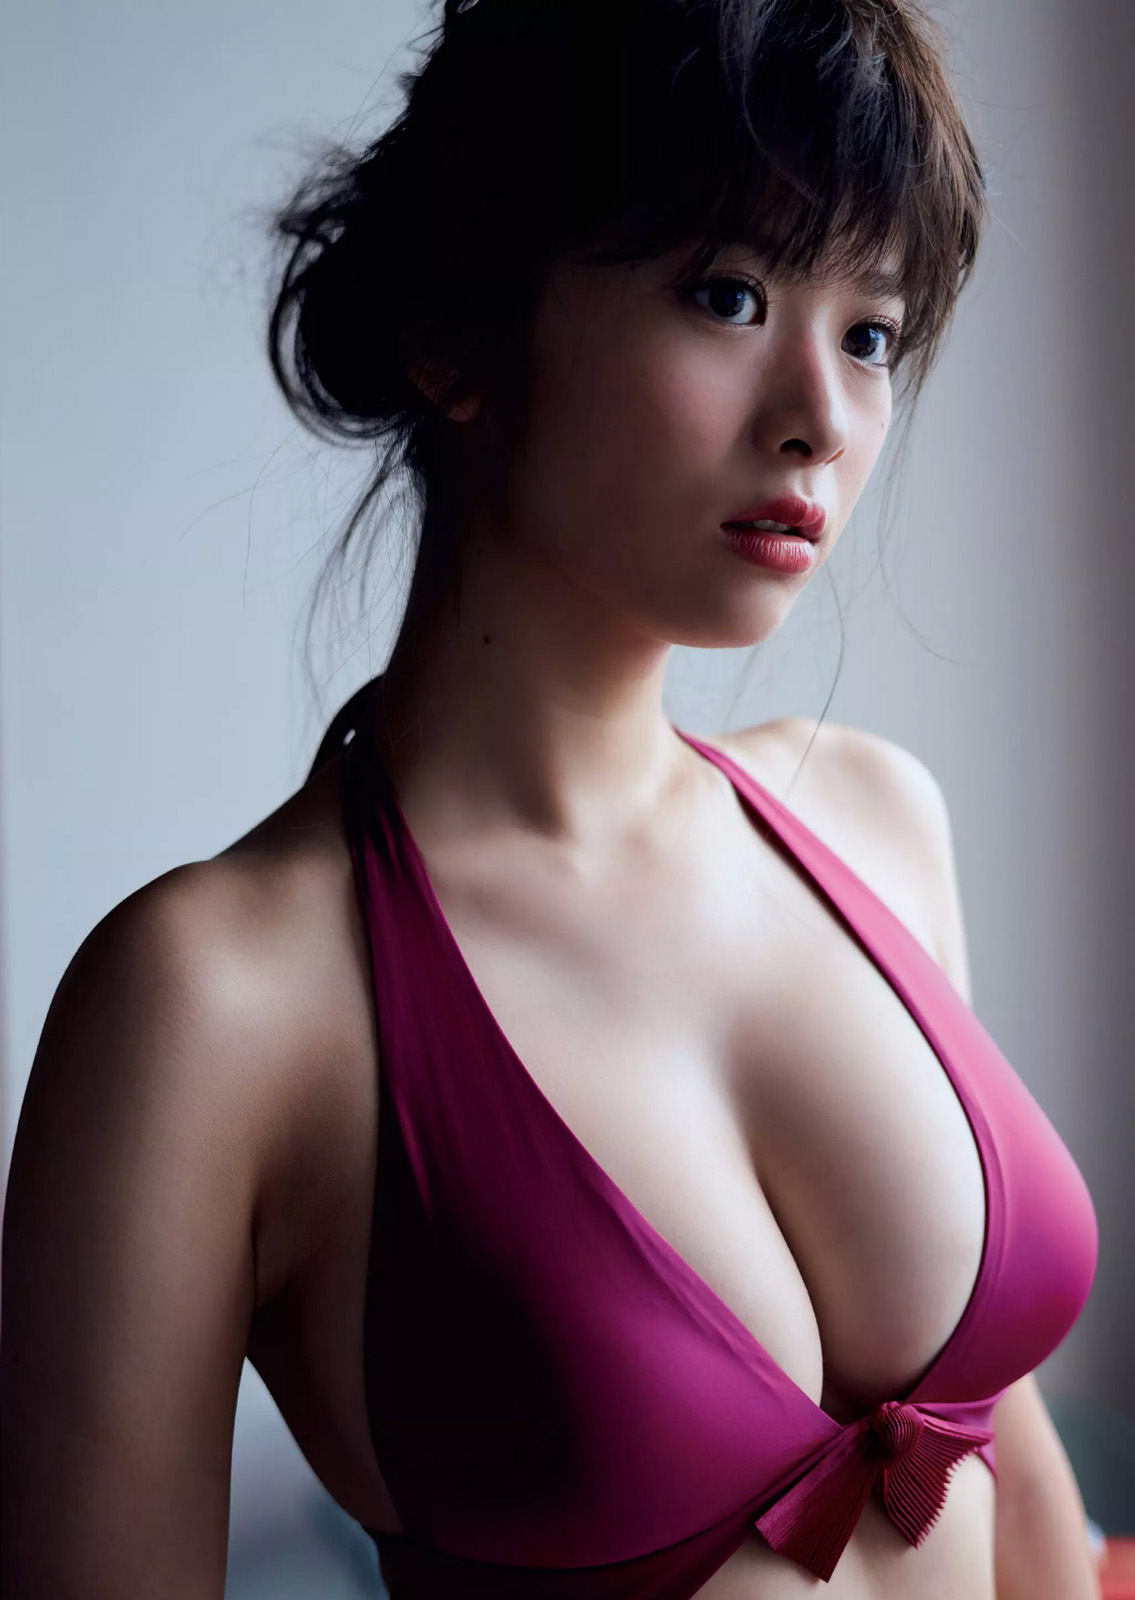 image http://scanlover.com/assets/images/414-BDUoj5VtqIb8AW1y.jpeg